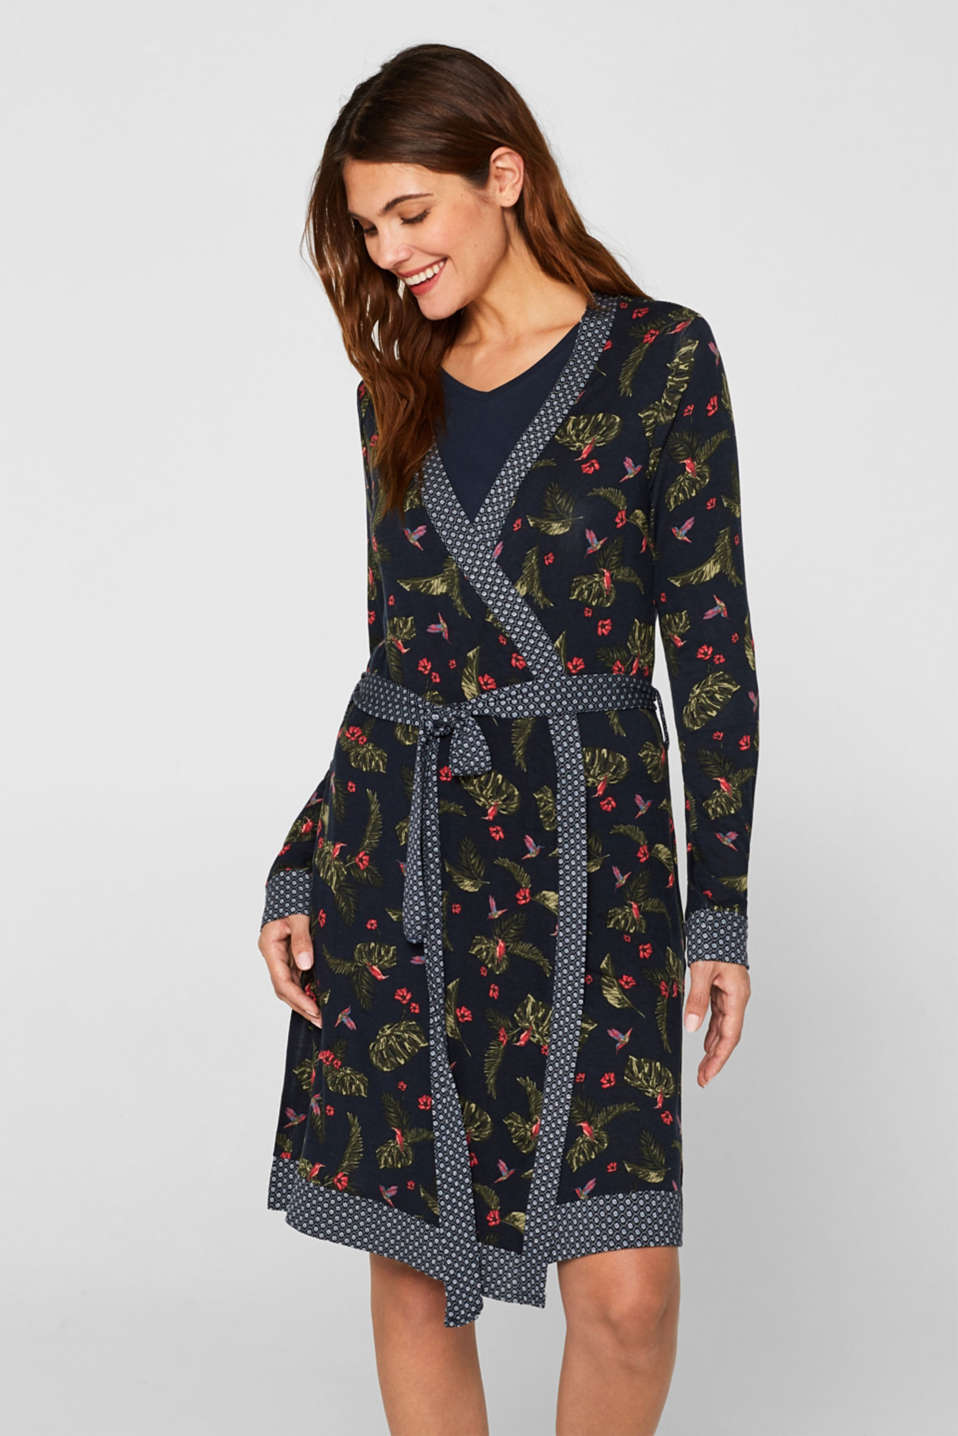 Pattern mix stretch jersey kimono, NAVY, detail image number 1